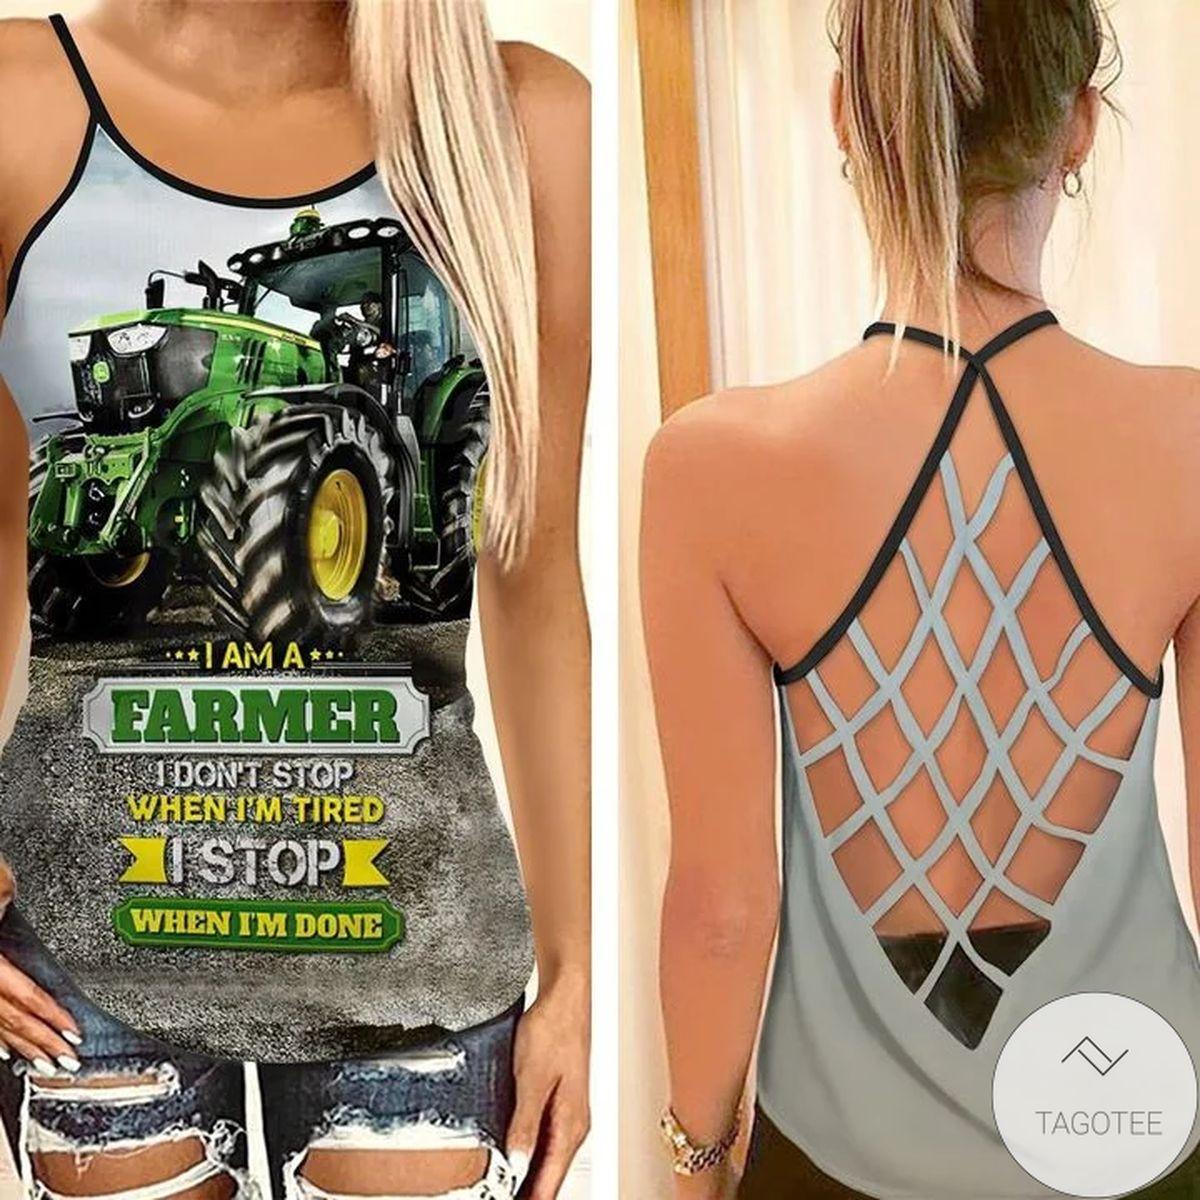 John Deere Tractor I'm A Farmer I Don't Stop When I'm Tired Criss Cross Tank Top